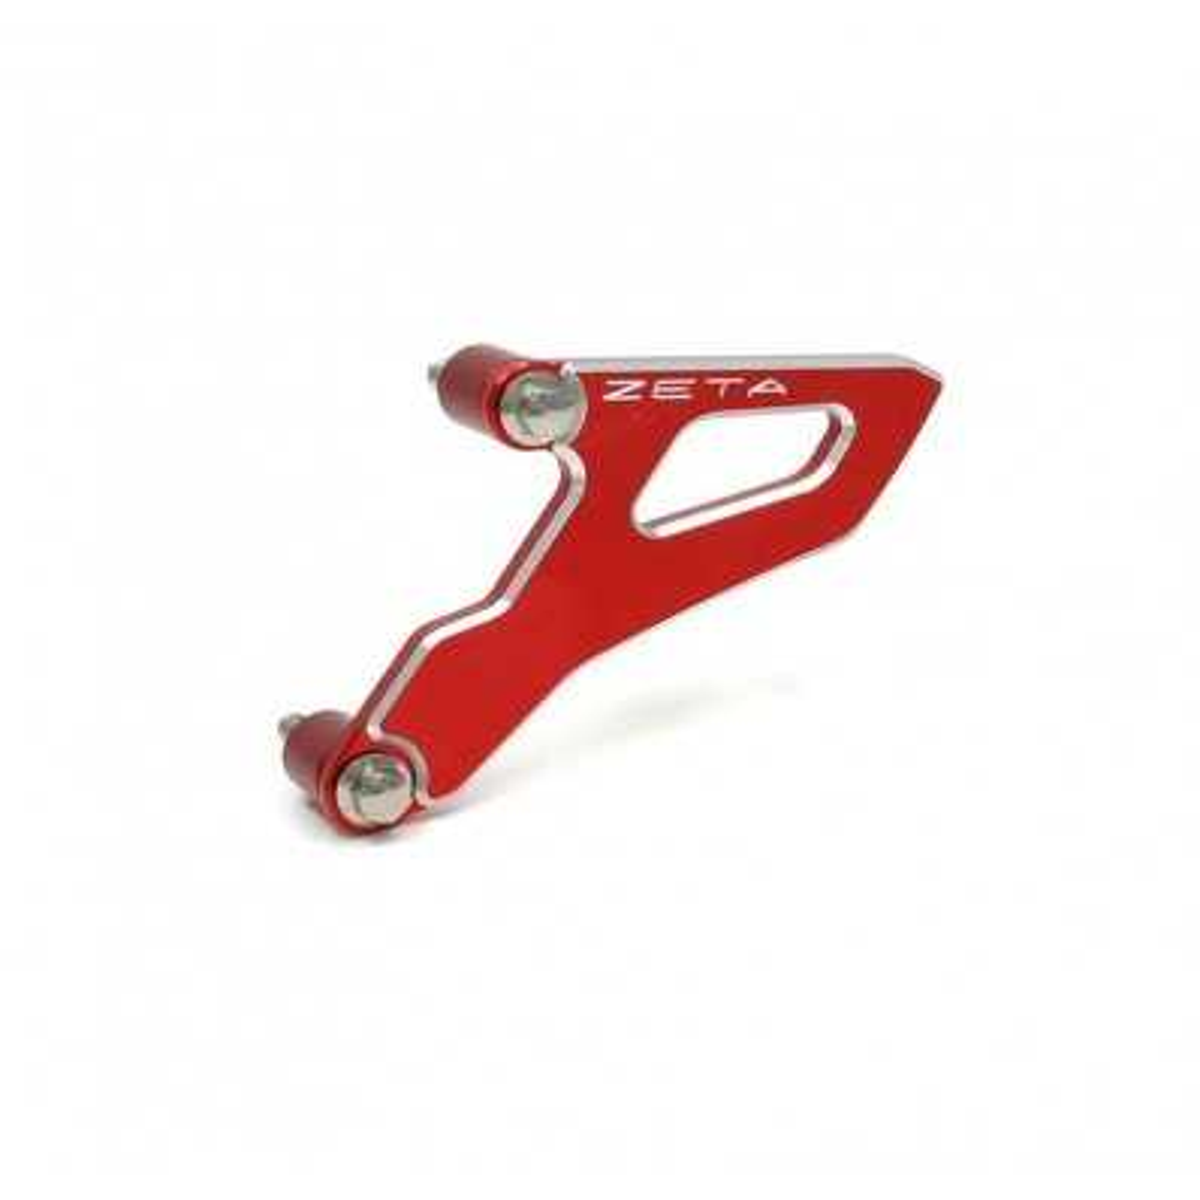 ZE80.9355 - Protector Piñon Salida Zeta Aluminio Crf250 450 10 17 Rojo